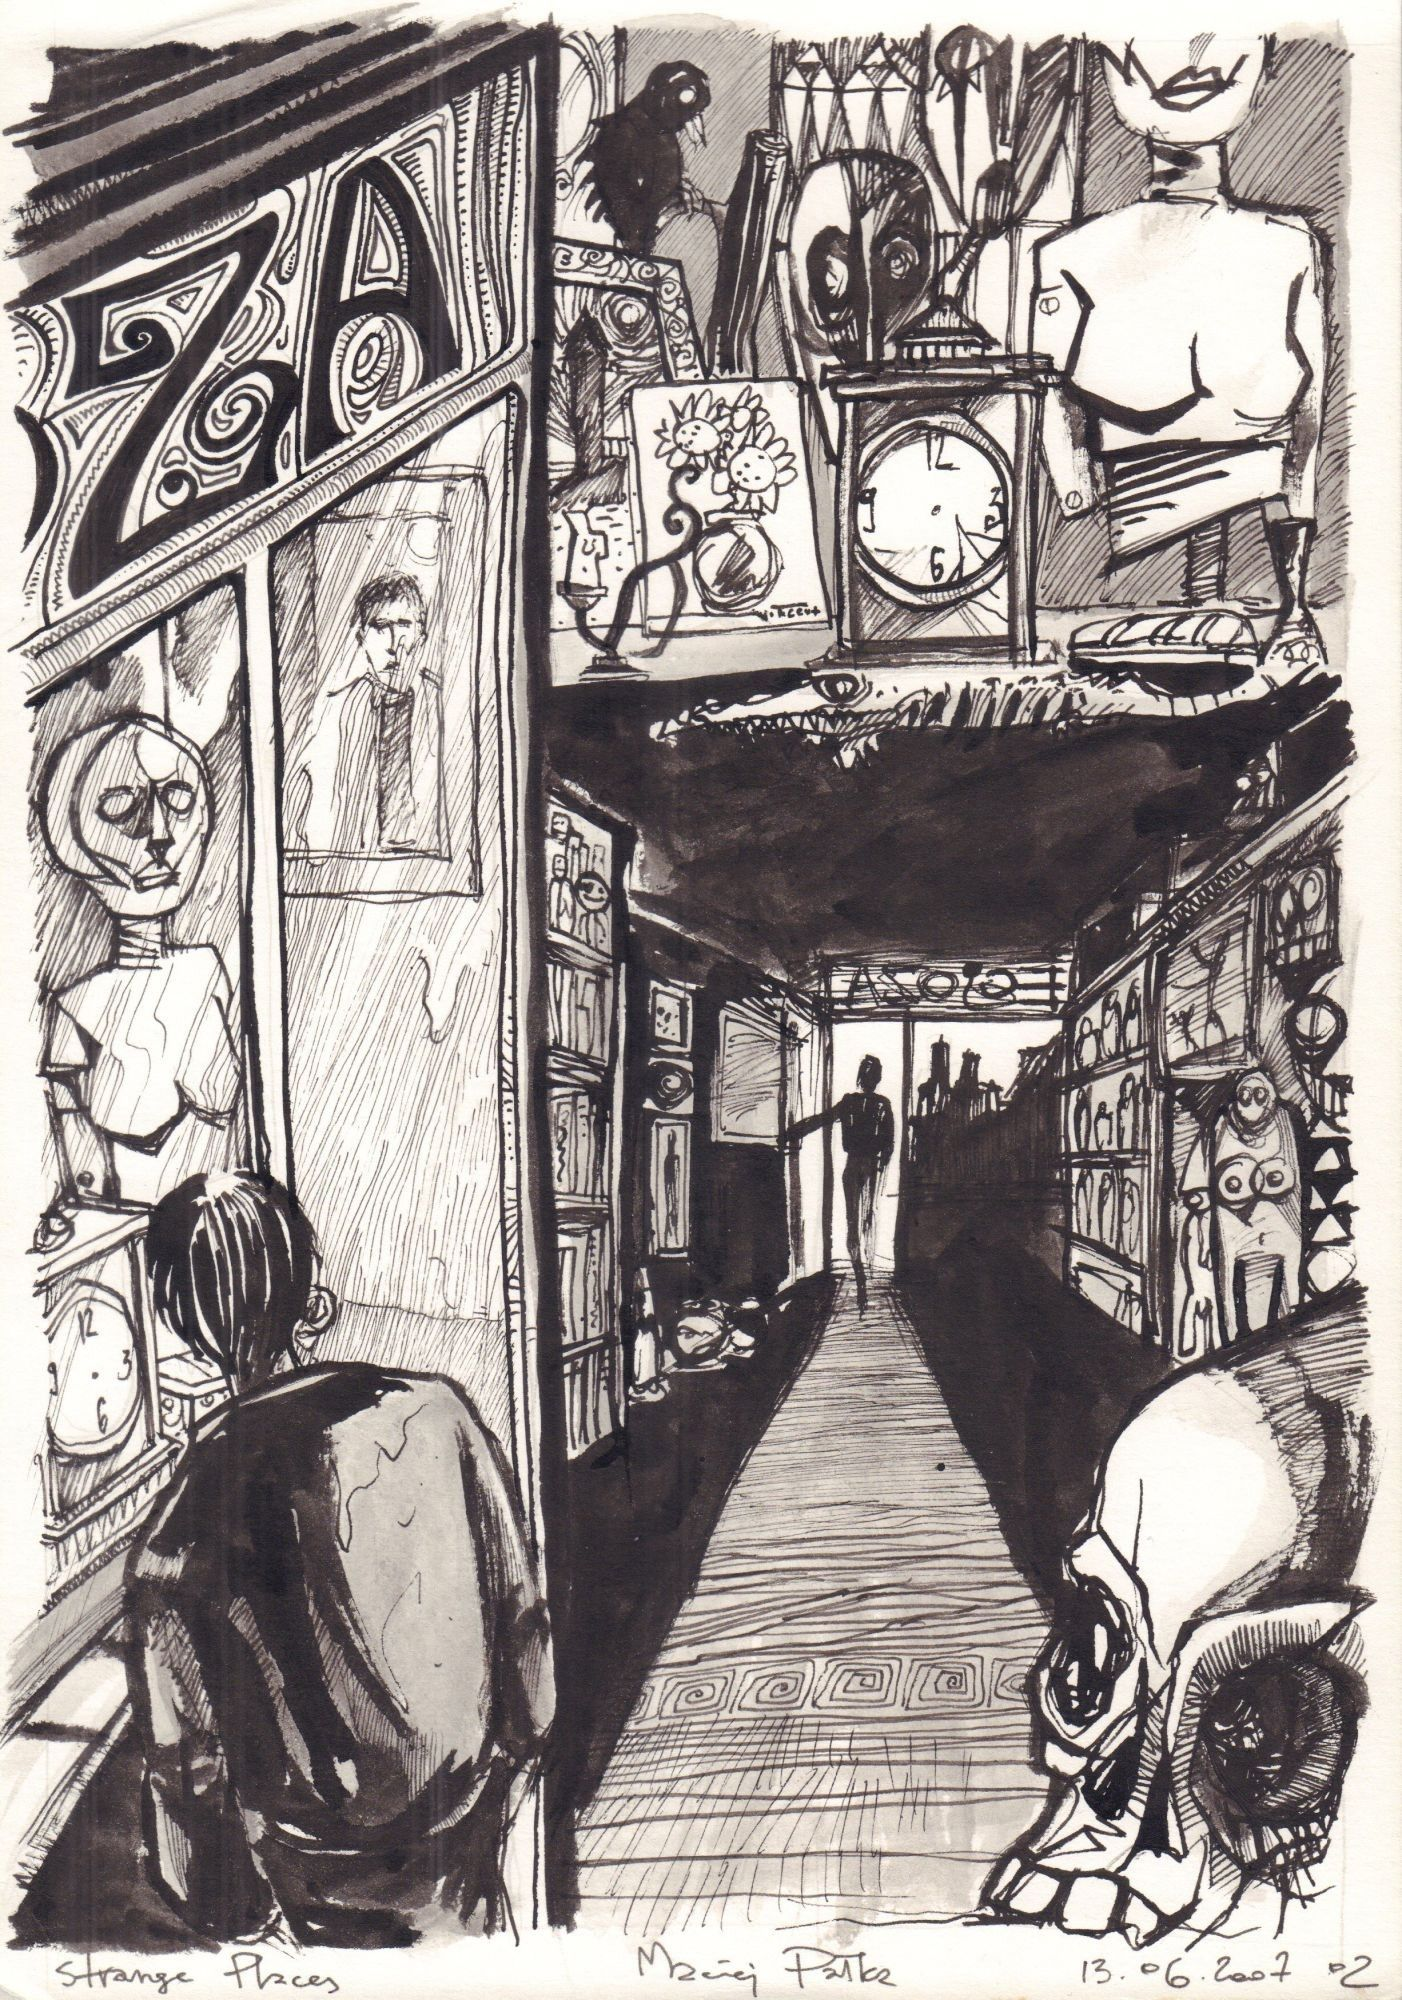 Benedykt Dampc. Strange Places, s. 3